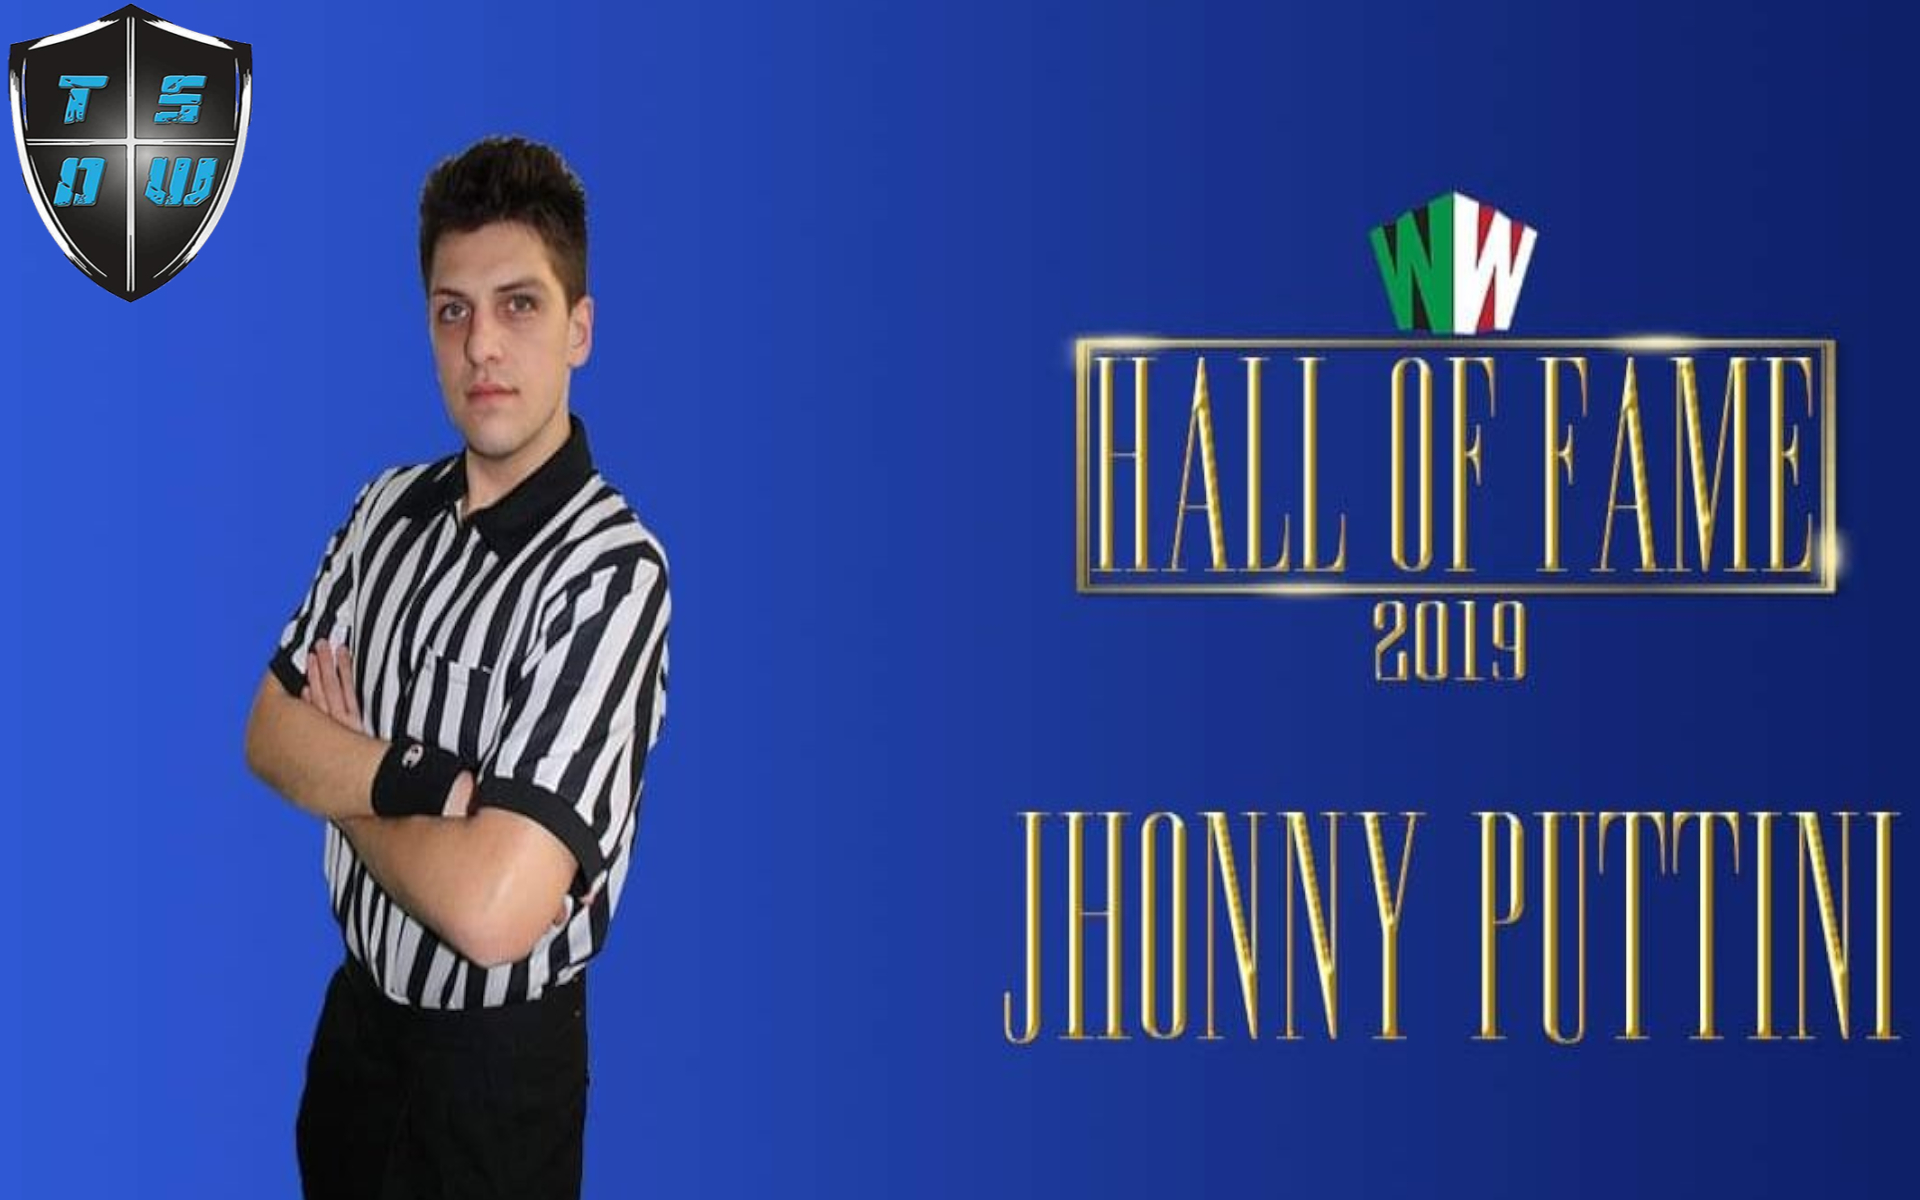 Jhonny Puttini